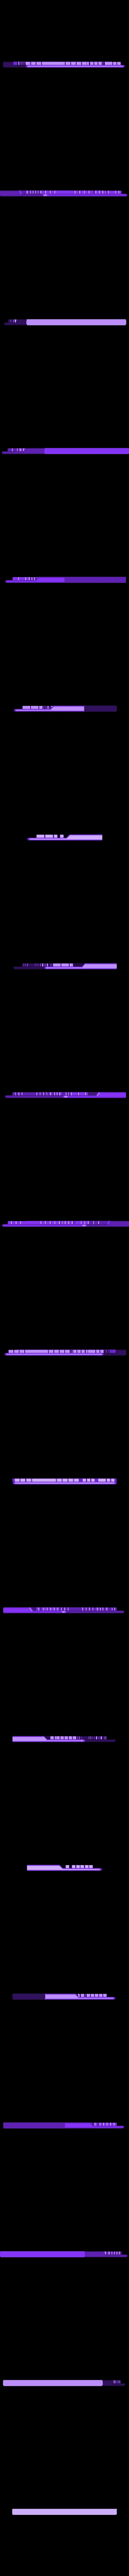 keyboard.stl Download free STL file ORCA communicator (Godzilla) • 3D printing object, poblocki1982